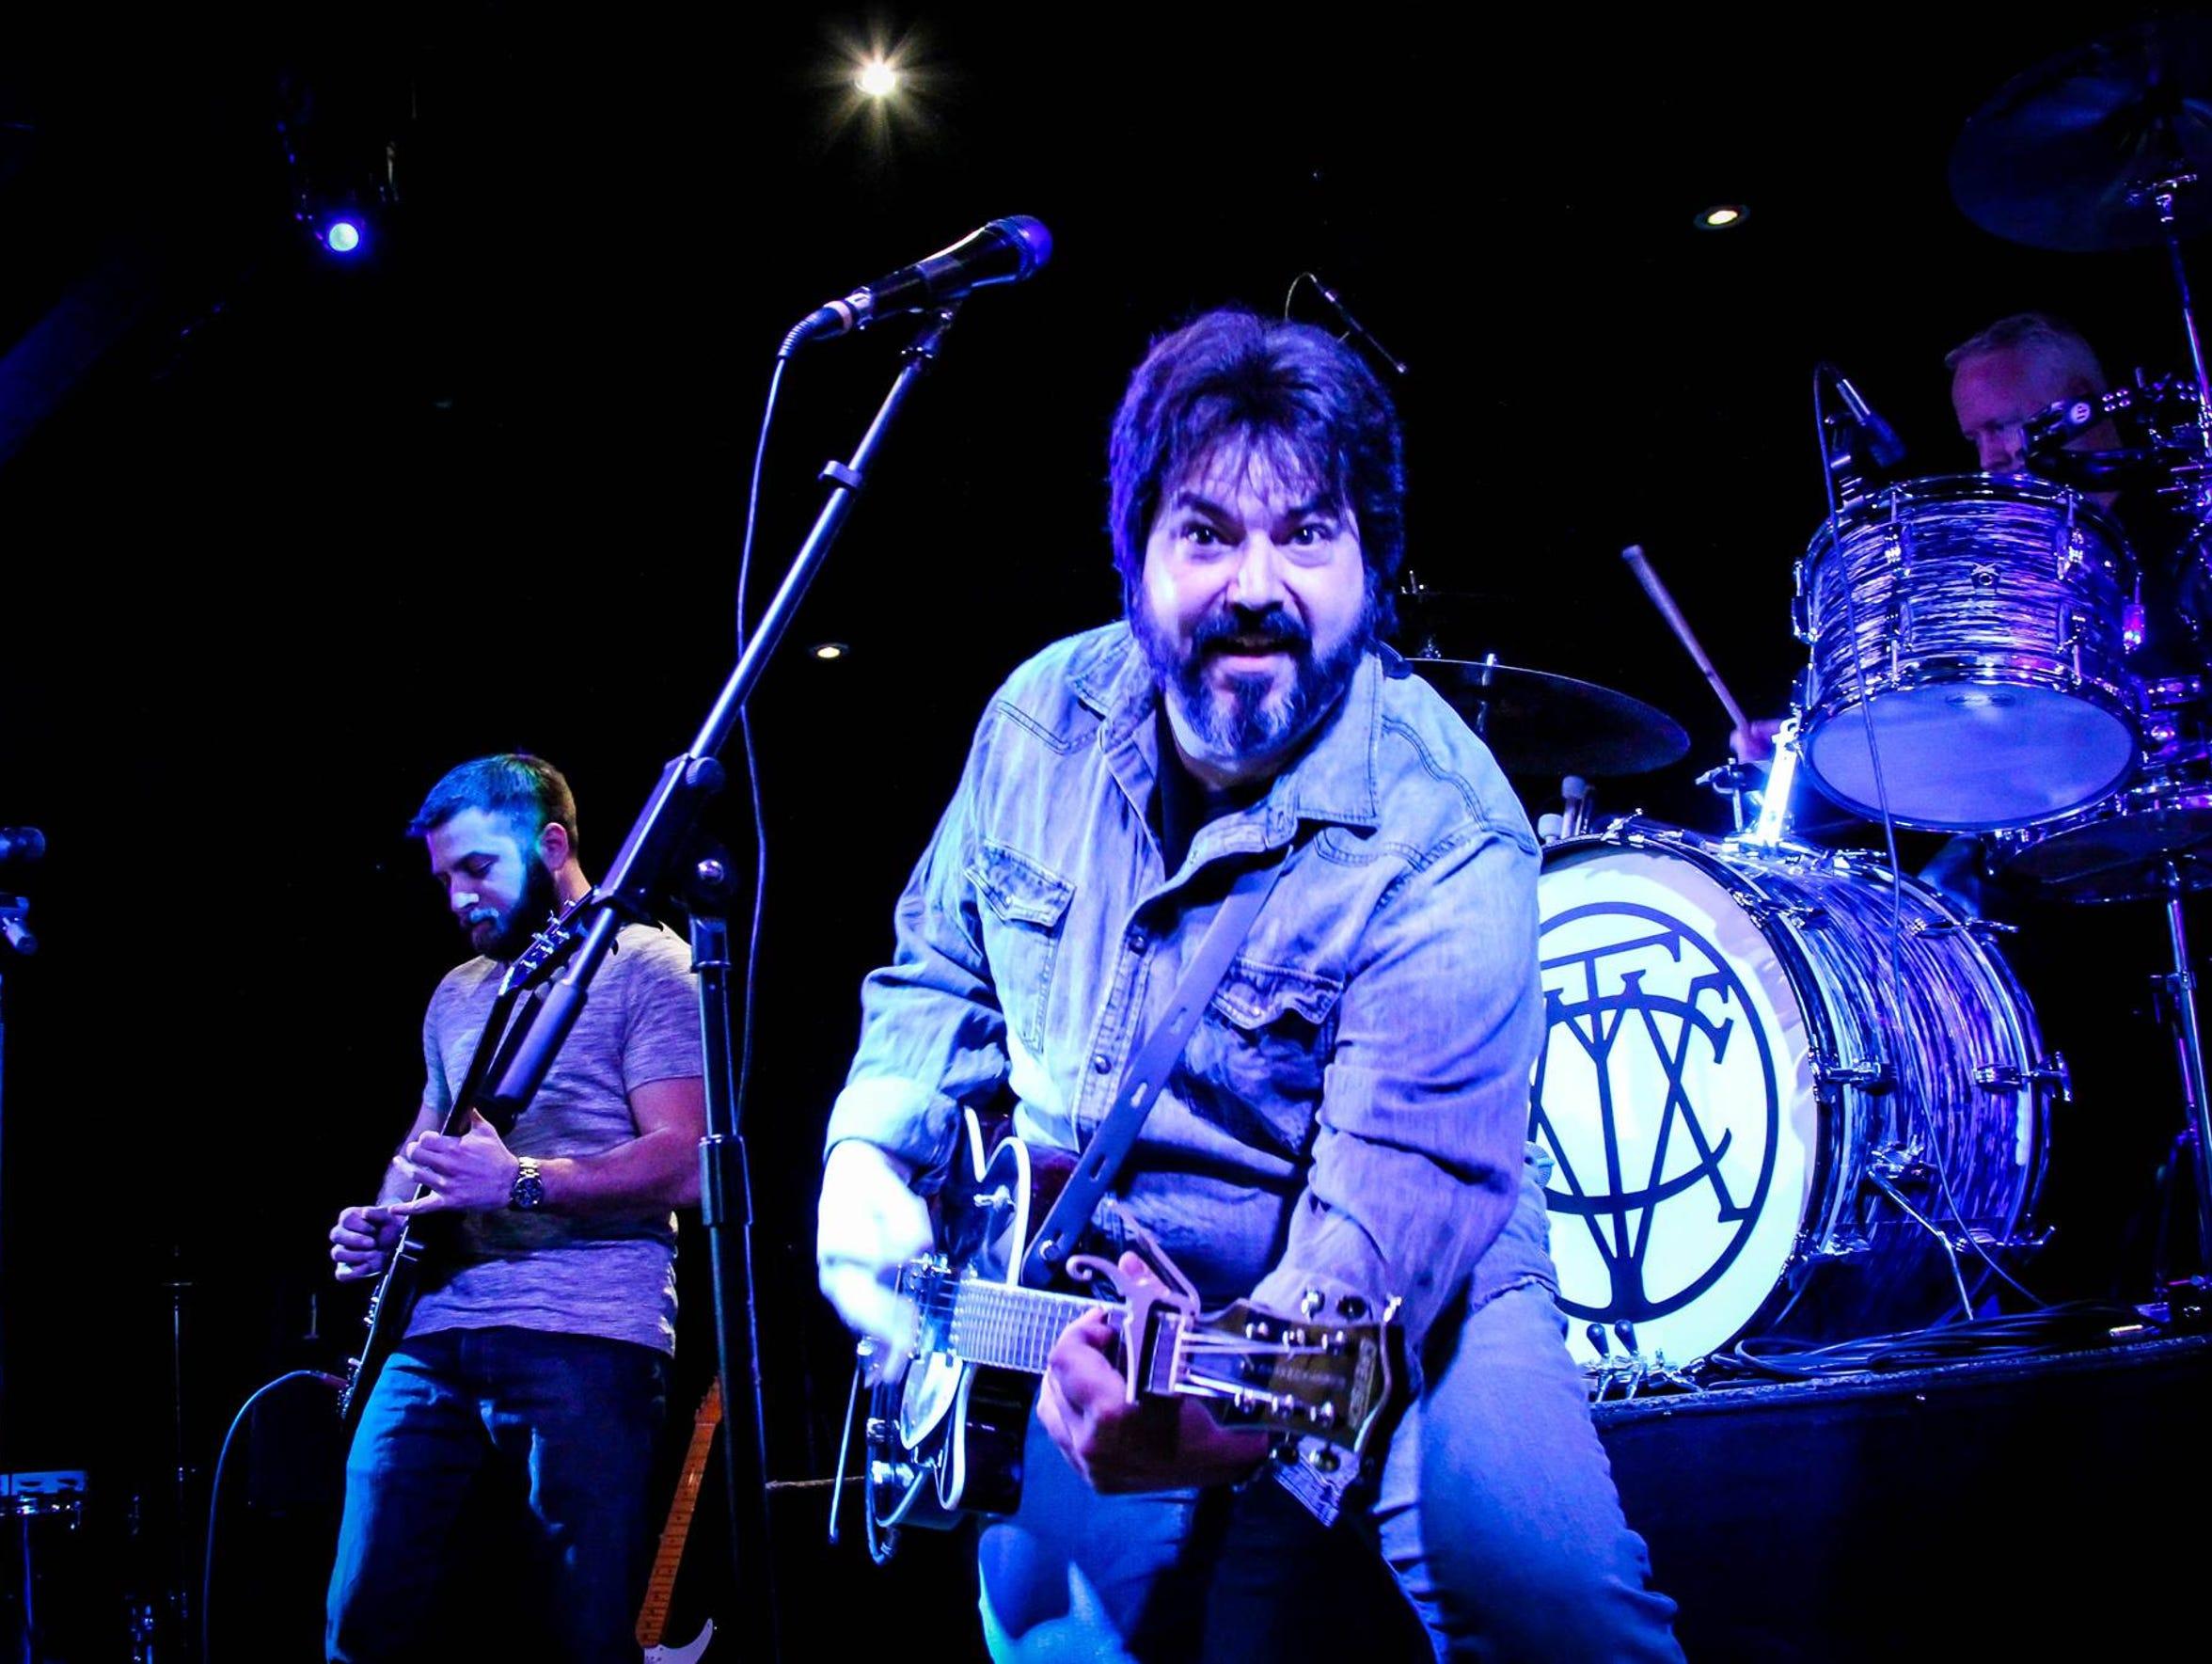 Anthony Parisi, of Thorofare, front his band Anthony